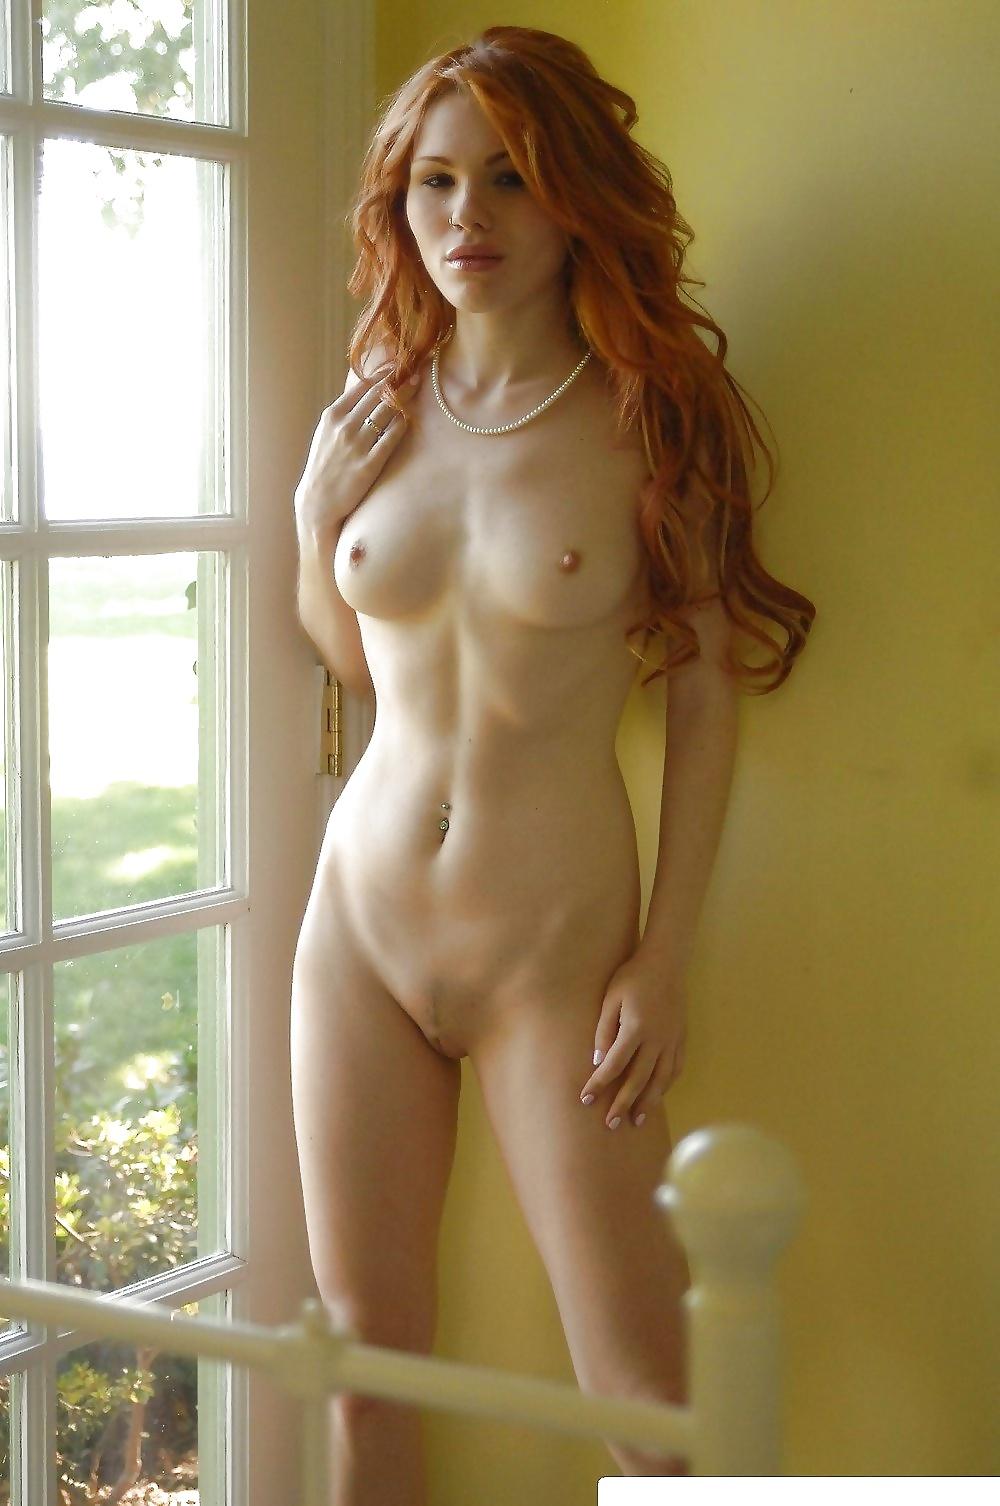 Nude redhead girl teasing on the floor